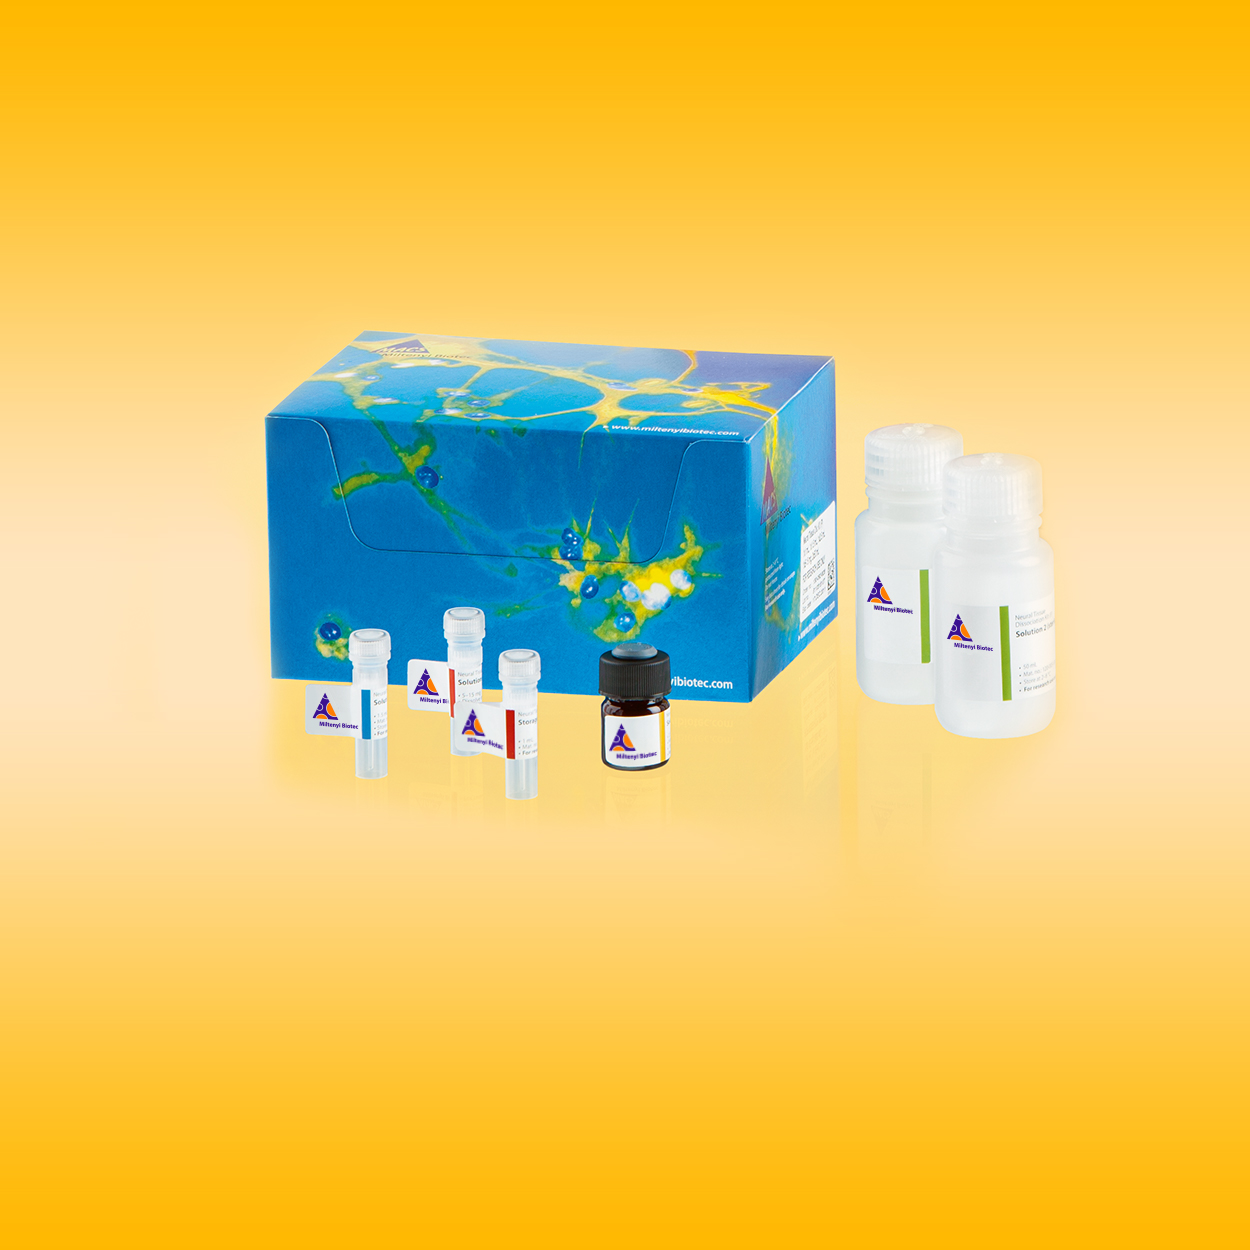 Tissue dissociation kits